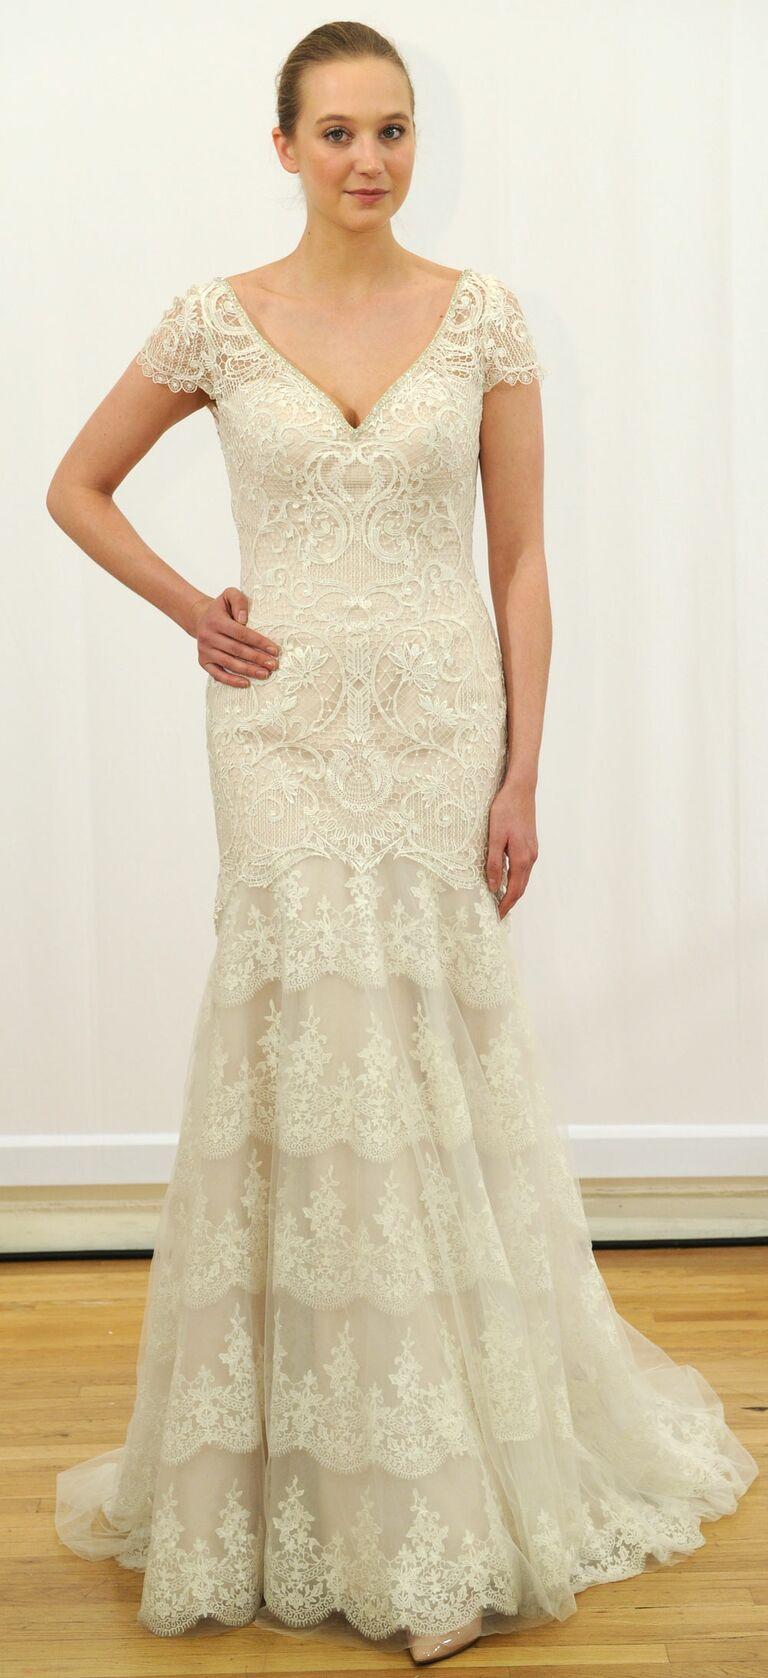 Val Stefani Spring Collection Bridal Fashion Week Photos